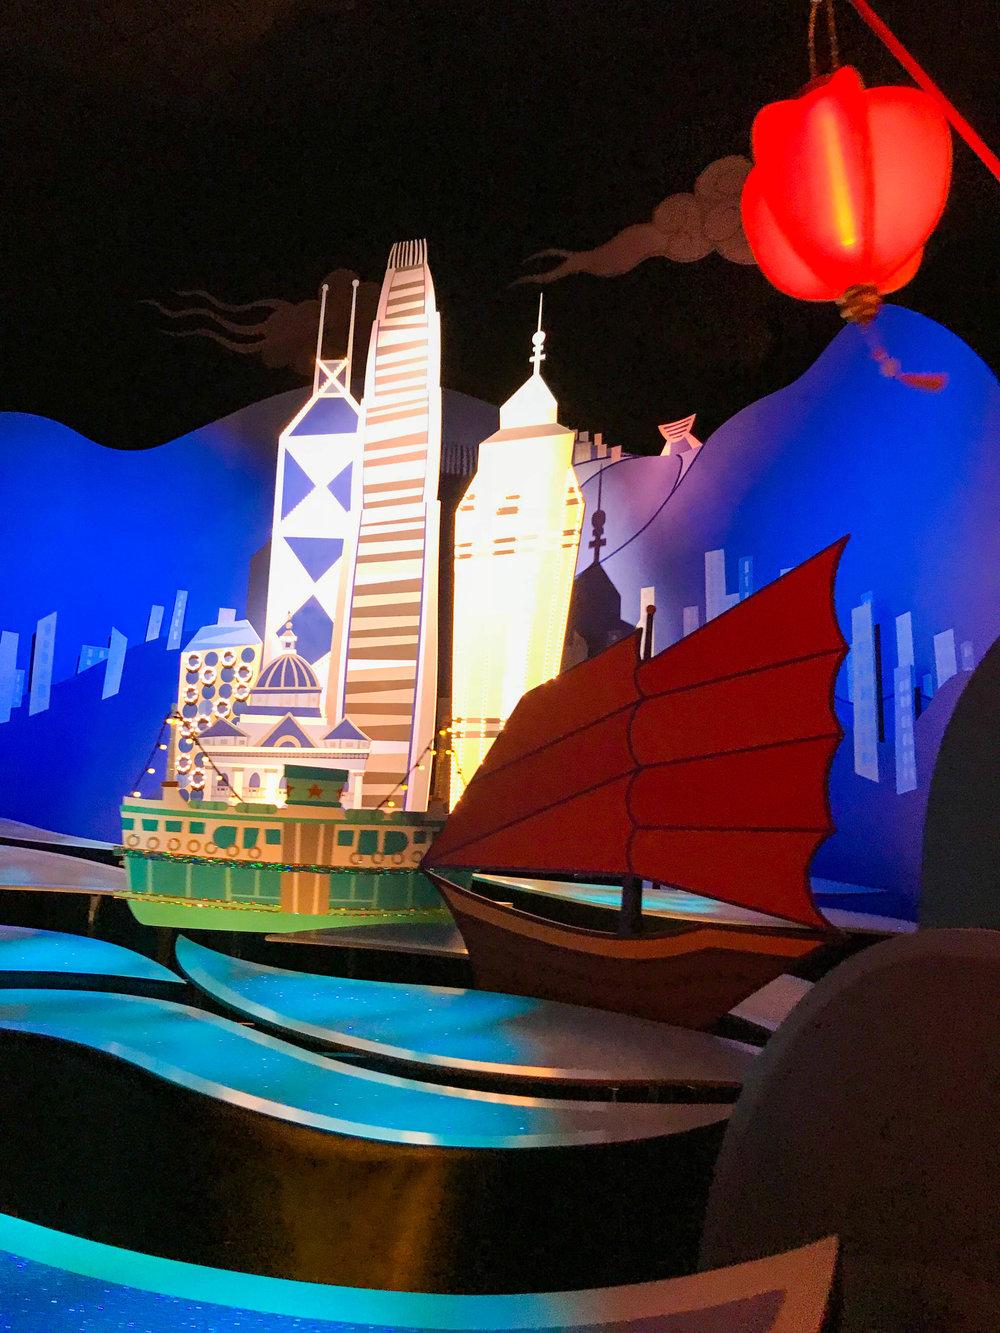 Hong-Kong=Disneyland-small-world-skyline.jpg